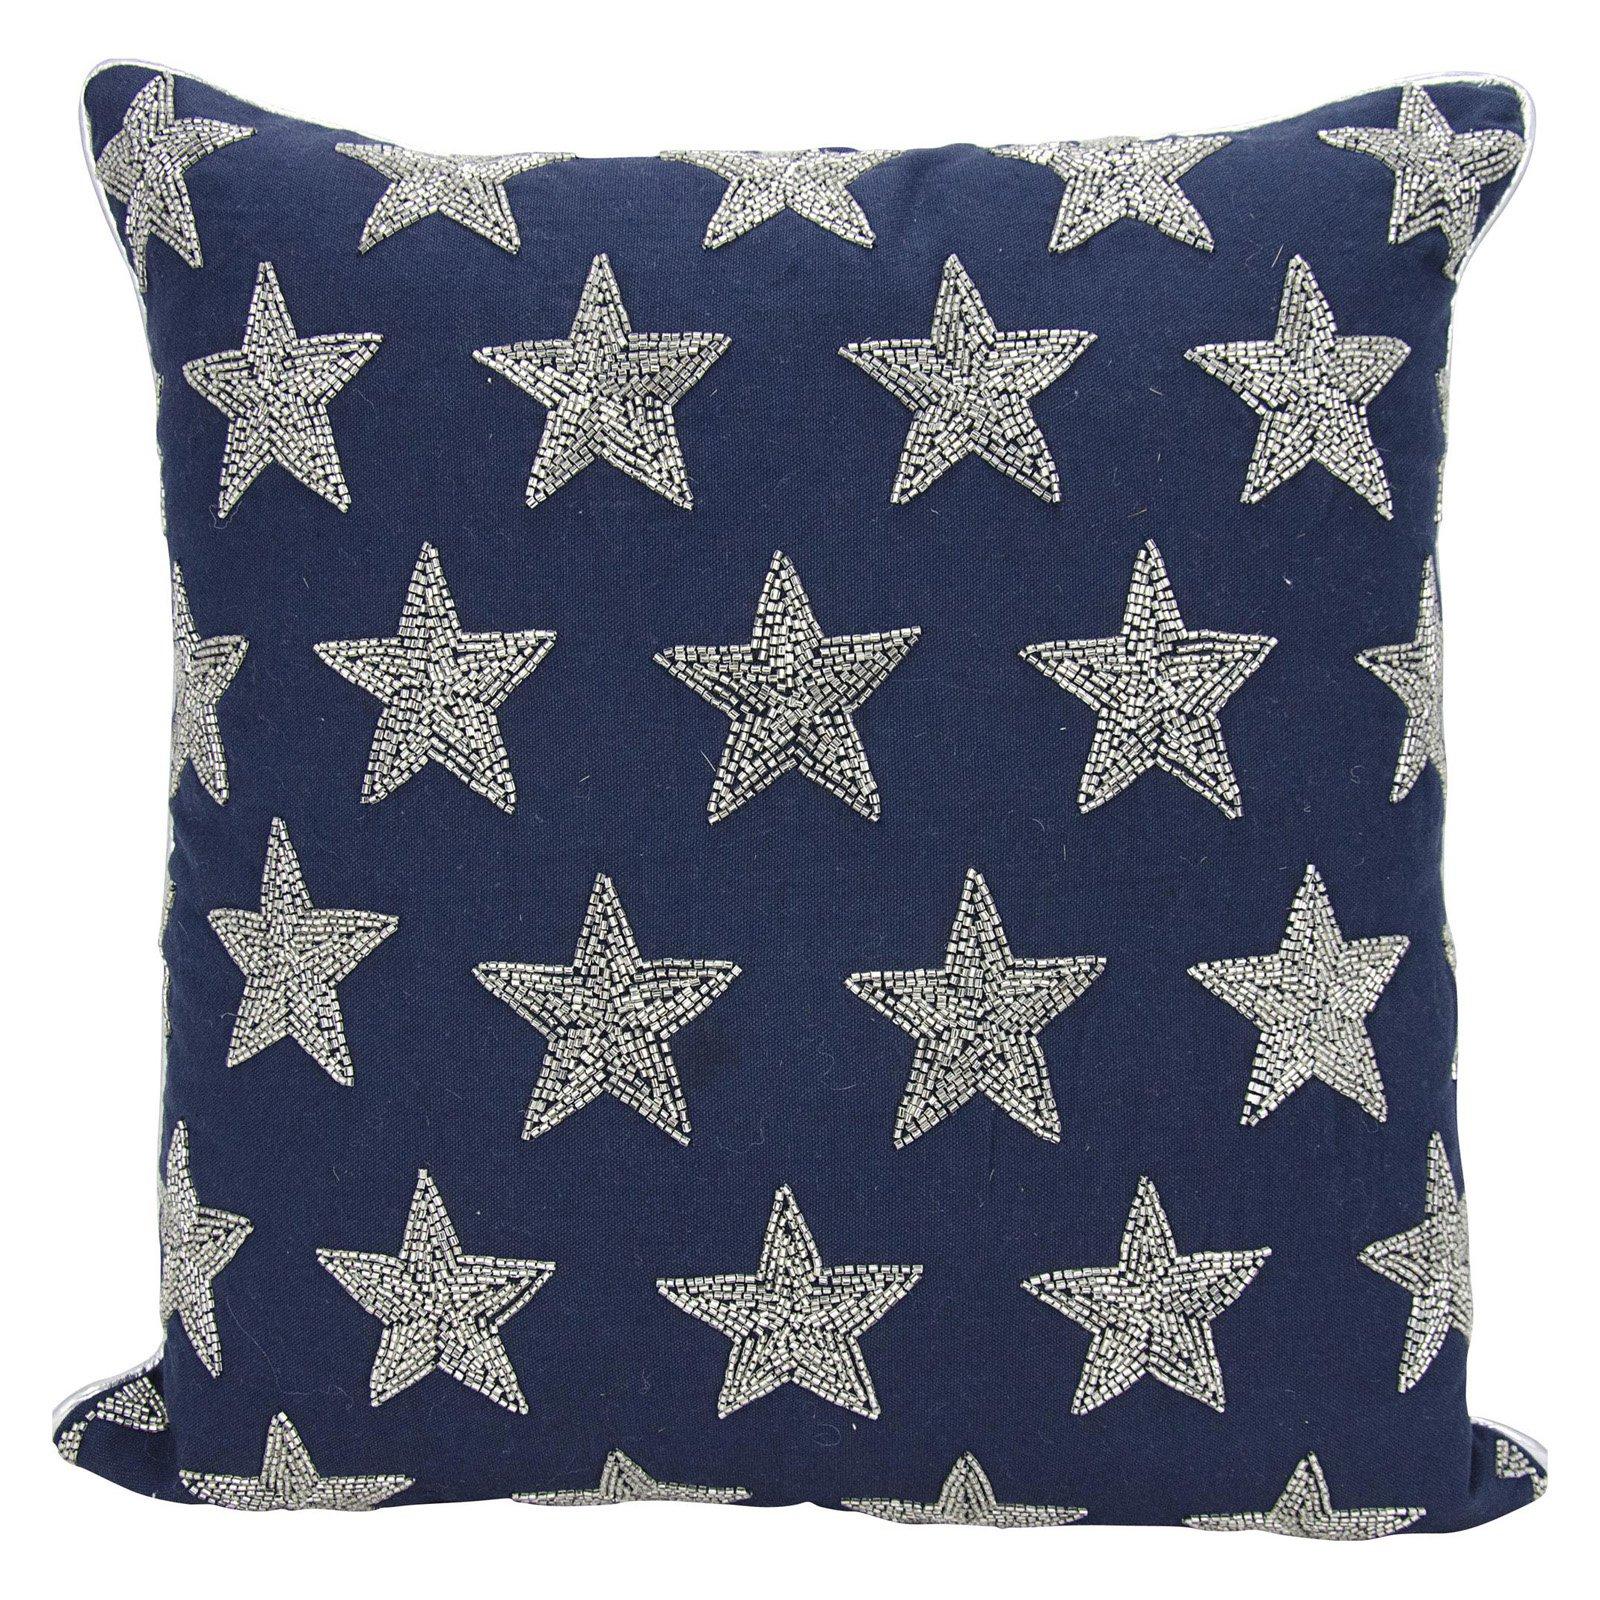 "Nourison Luminecence Beaded Stars Decorative Throw Pillow, 20"" x 20"", Navy/Silver"